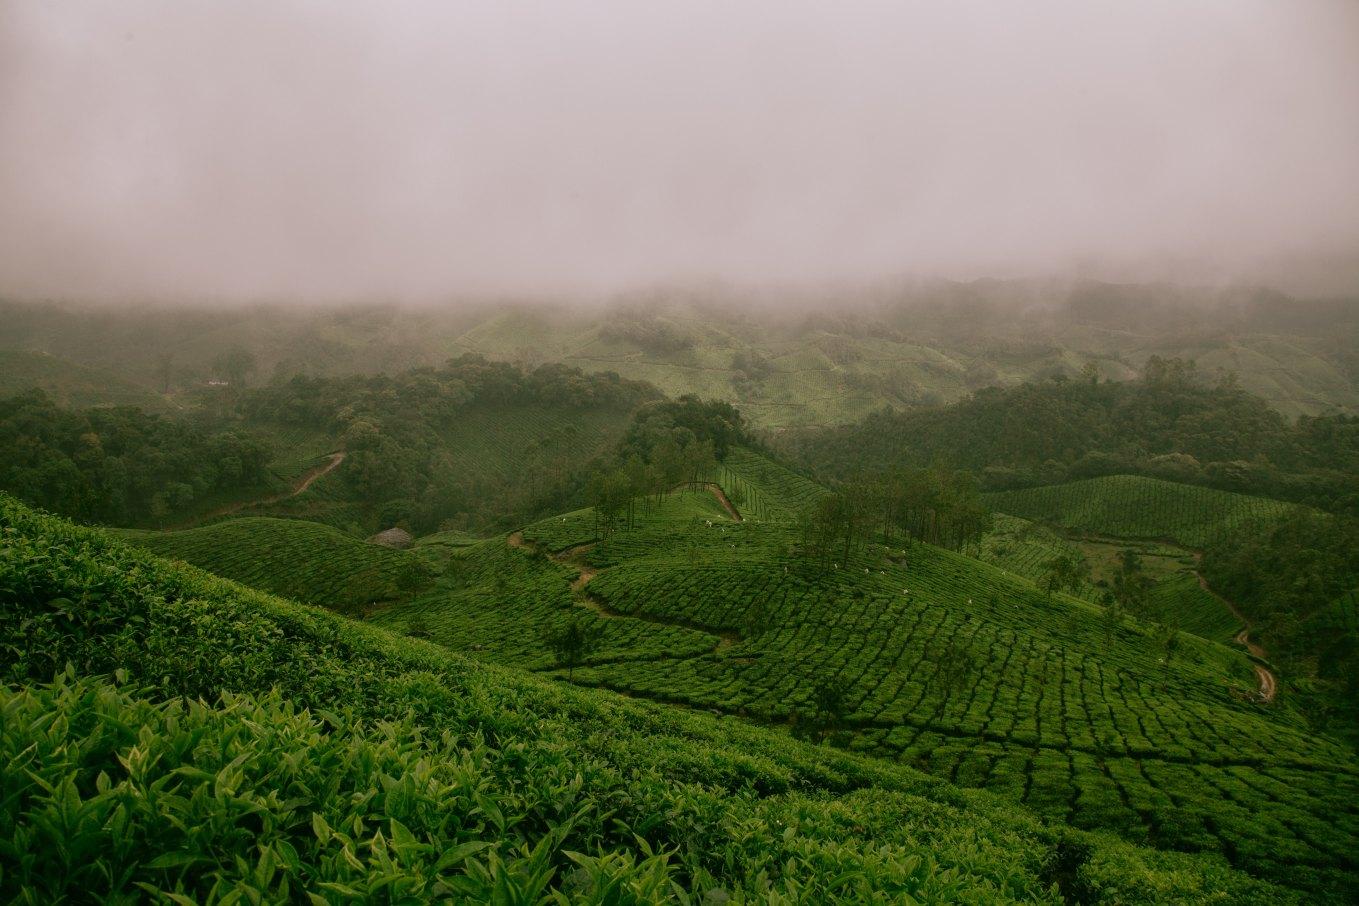 Image of the hillstation Munnar in Kerala